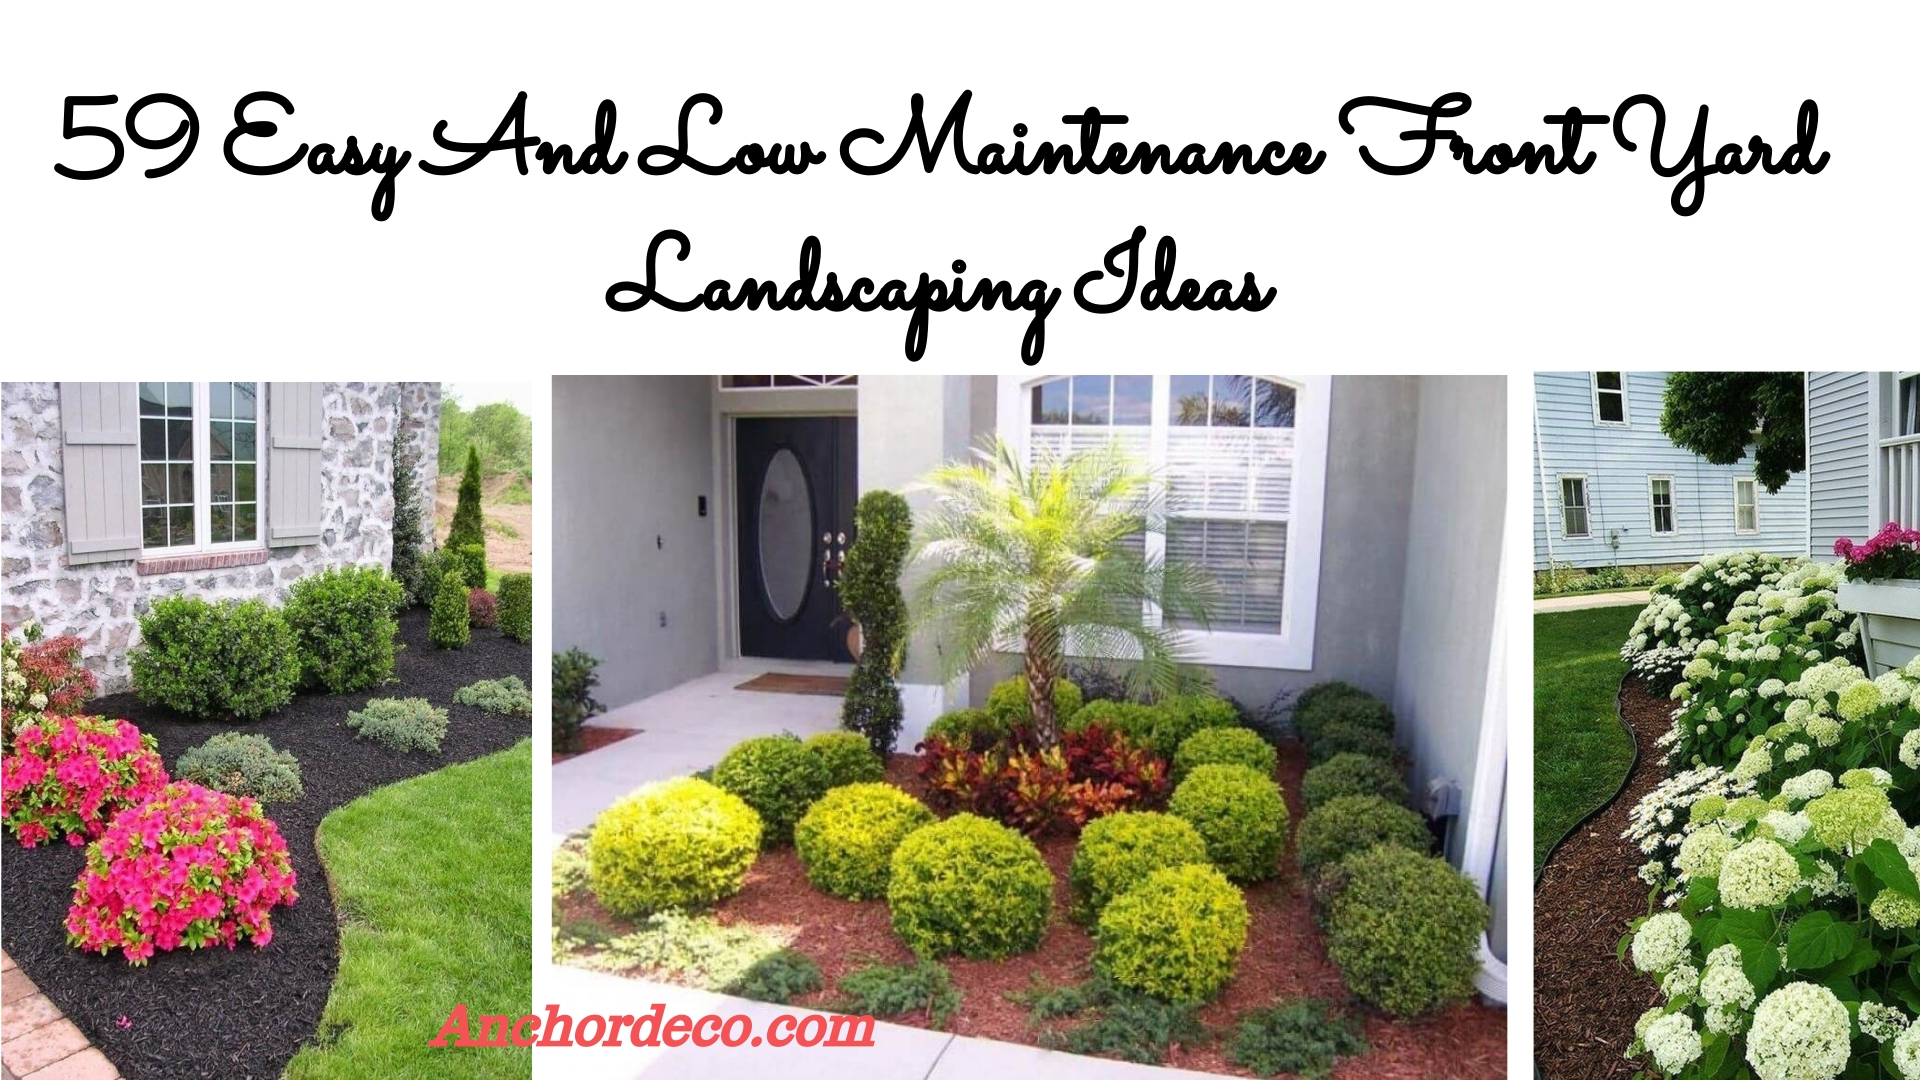 59 Easy And Low Maintenance Front Yard Landscaping Ideas ... on Low Maintenance:cyizg0Gje0G= Backyard Designs  id=44513